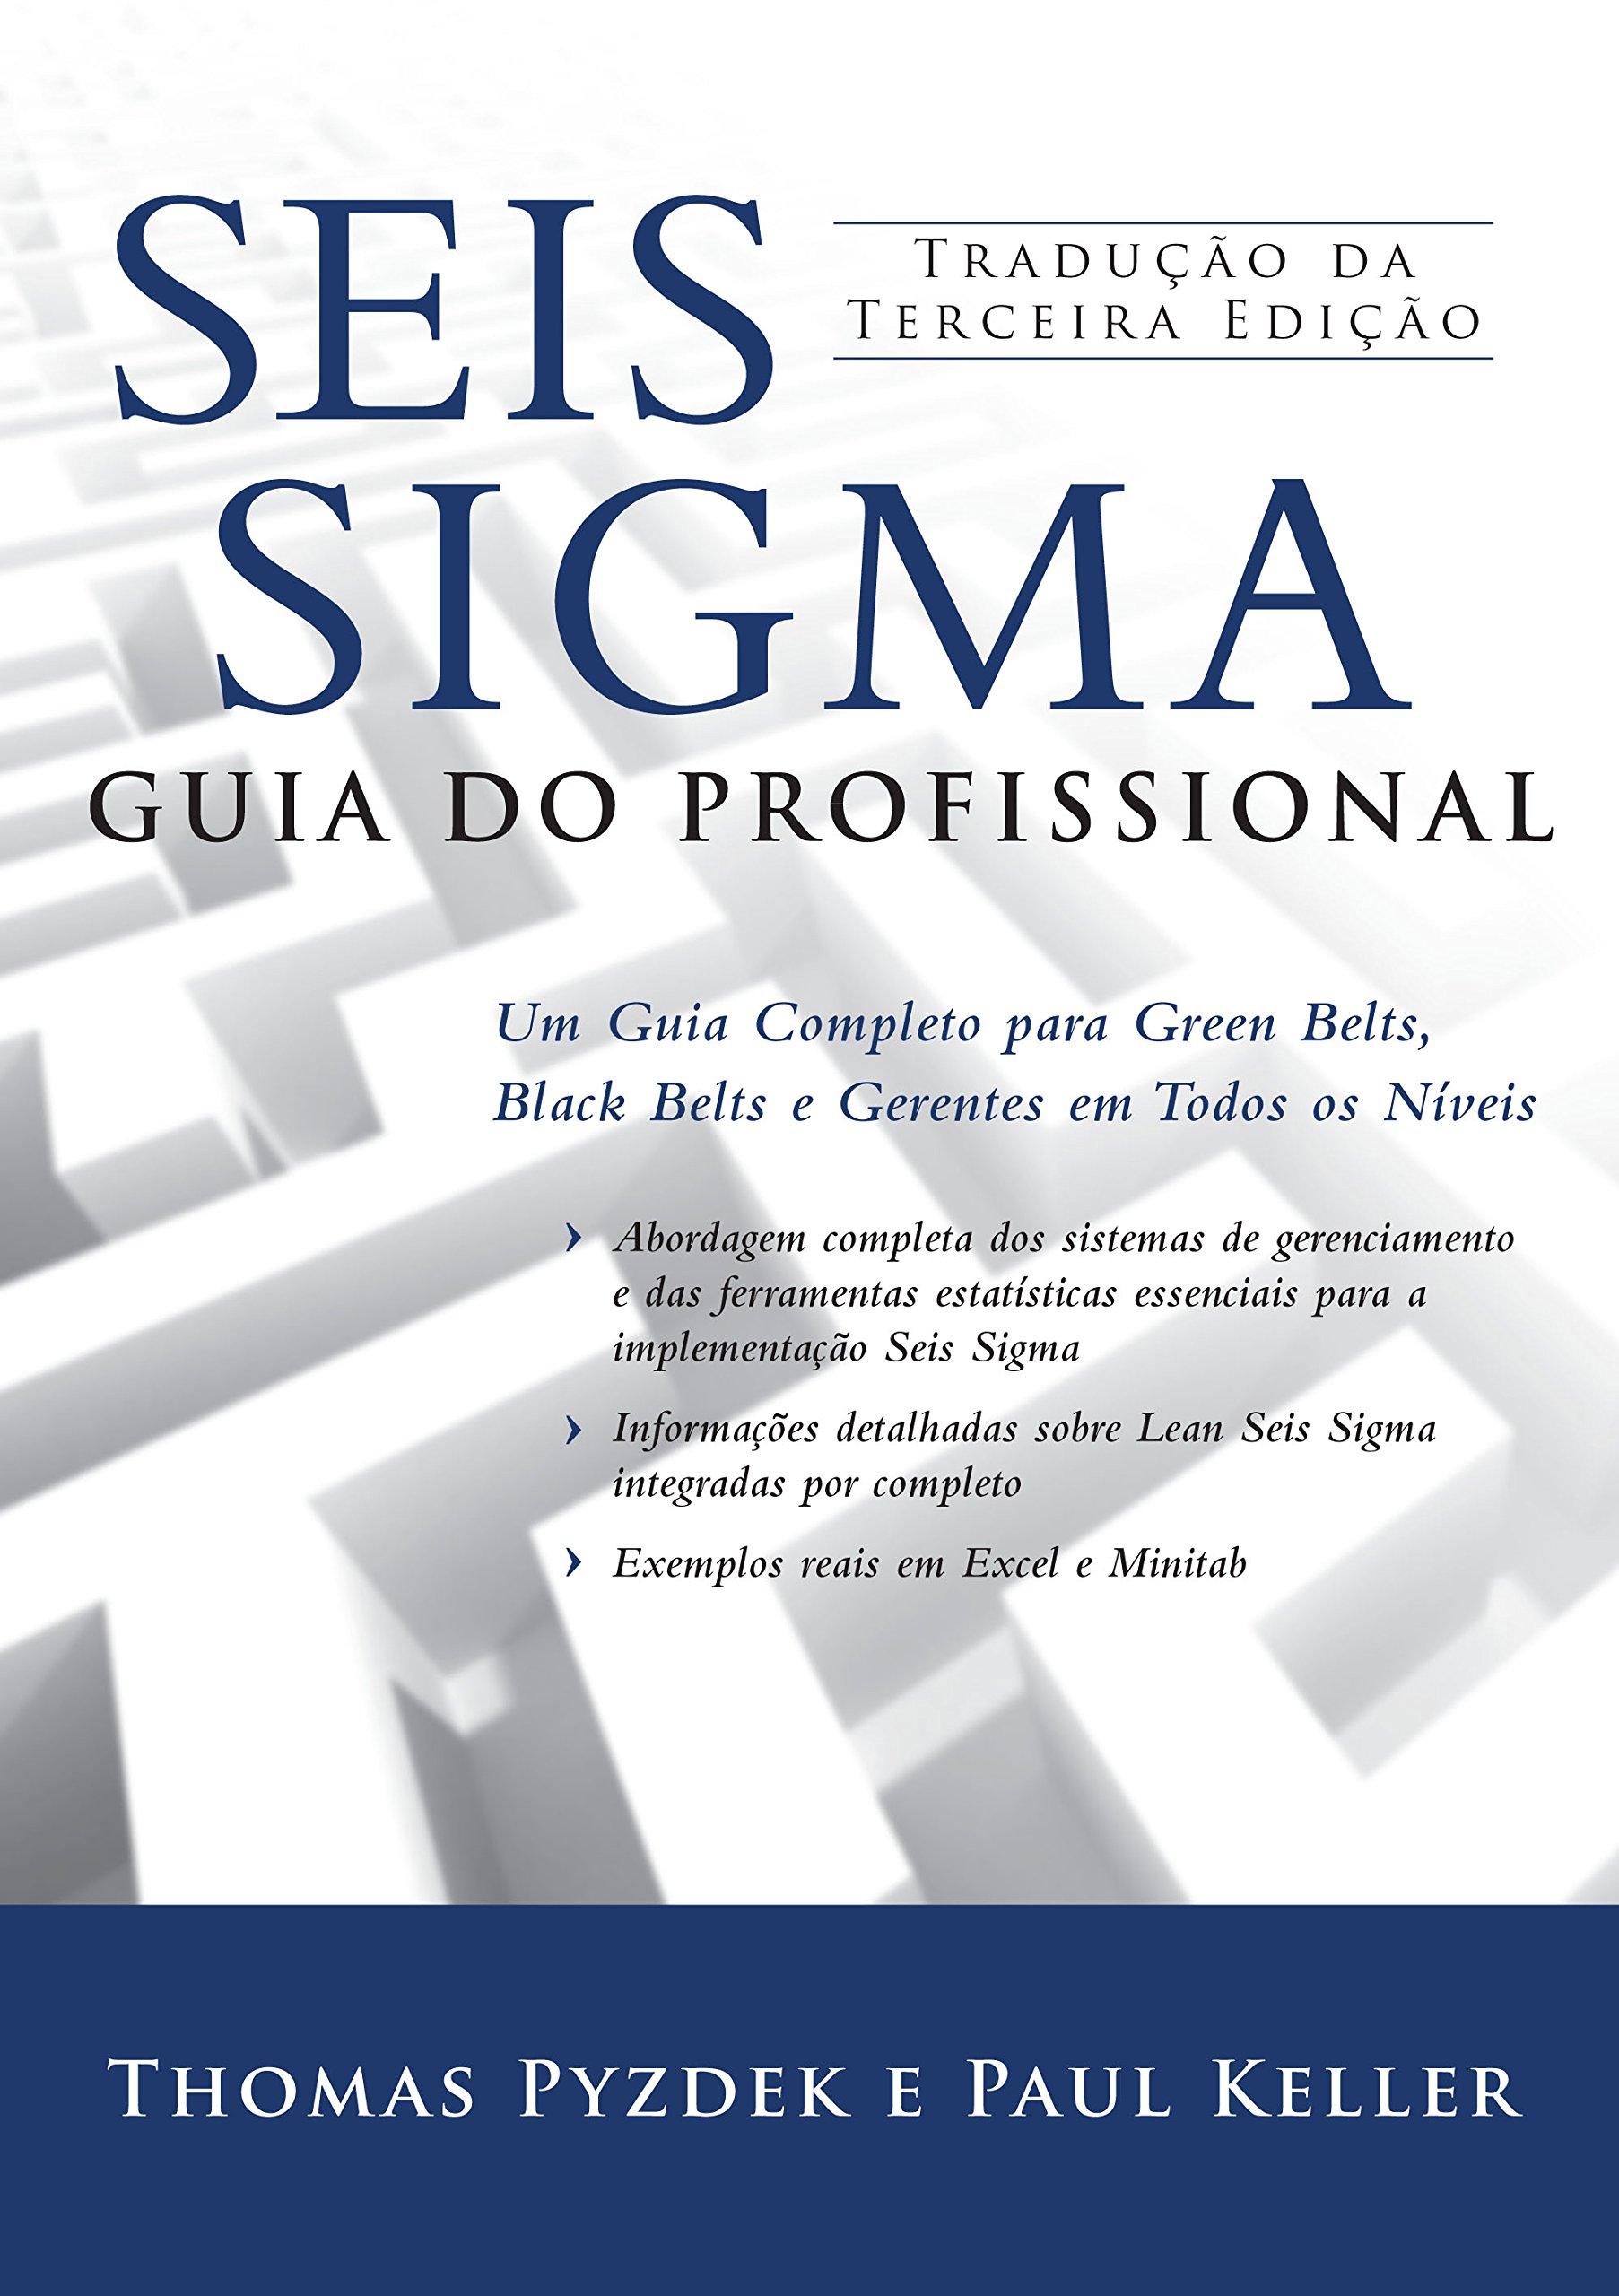 Seis Sigma Guia Do Profissional 9788576085515 Livros Na Amazon